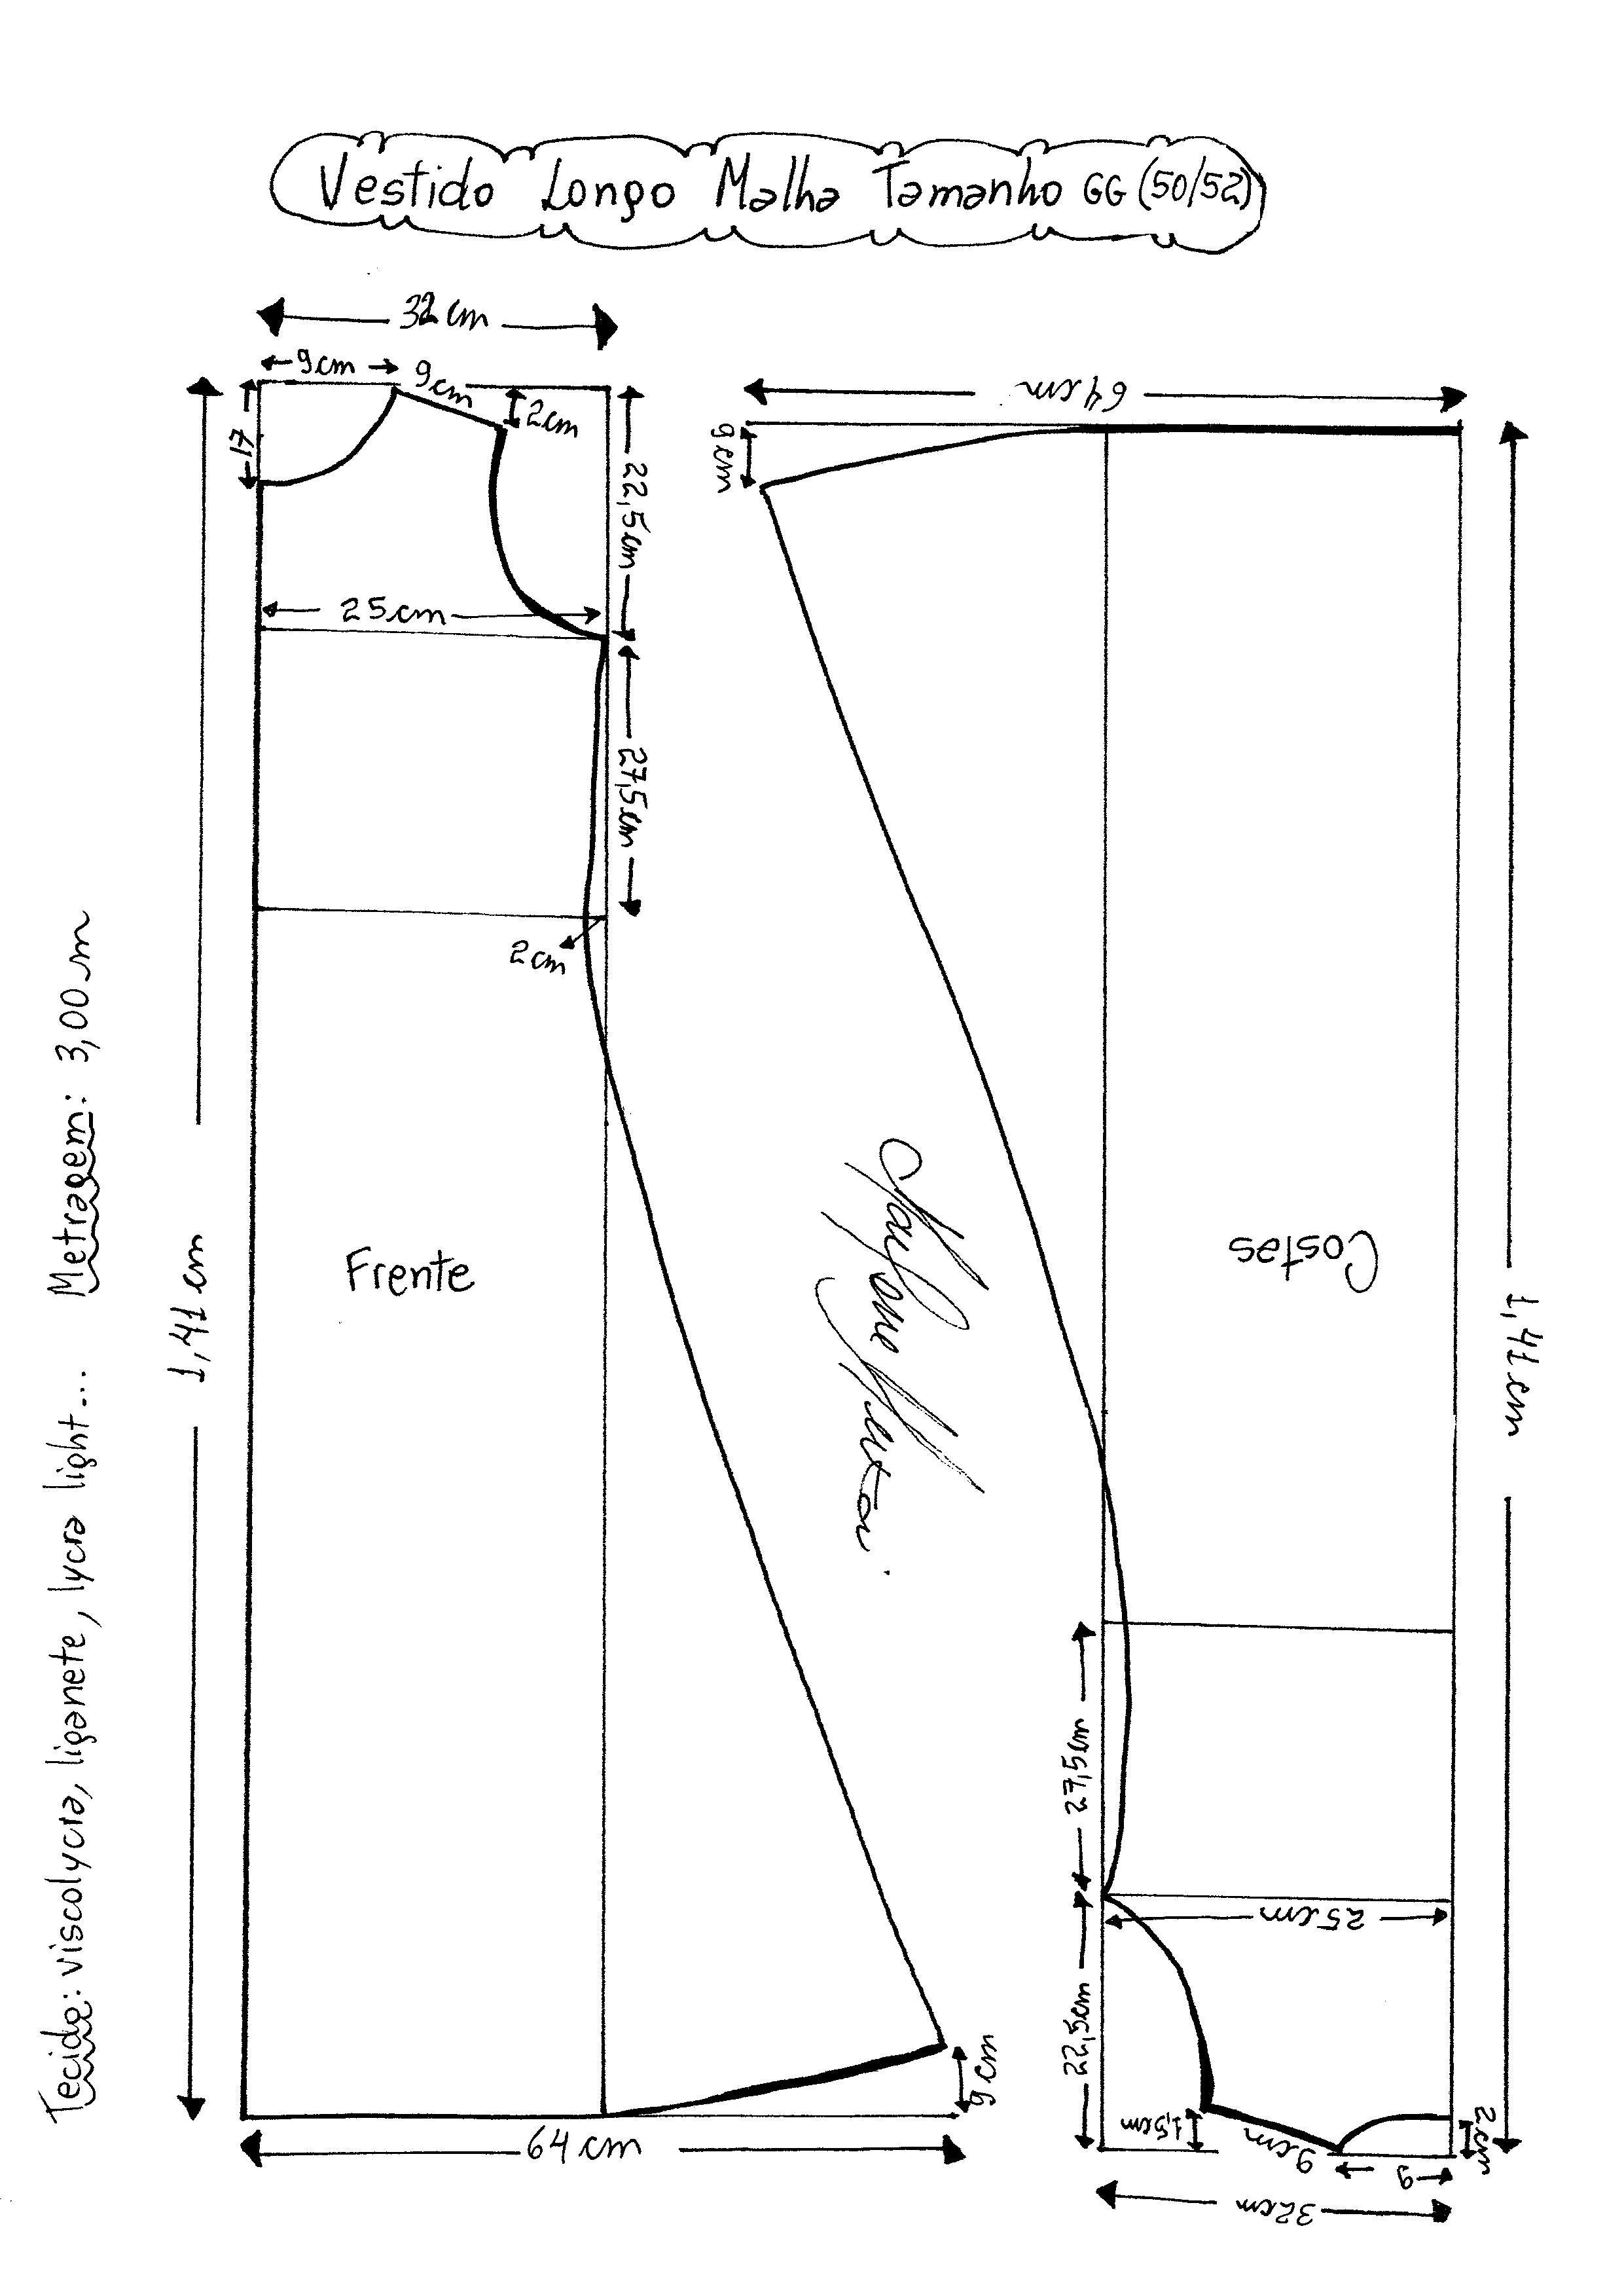 Vestido longo de Malha Regata | moldes.. tabelas e afins | Pinterest ...